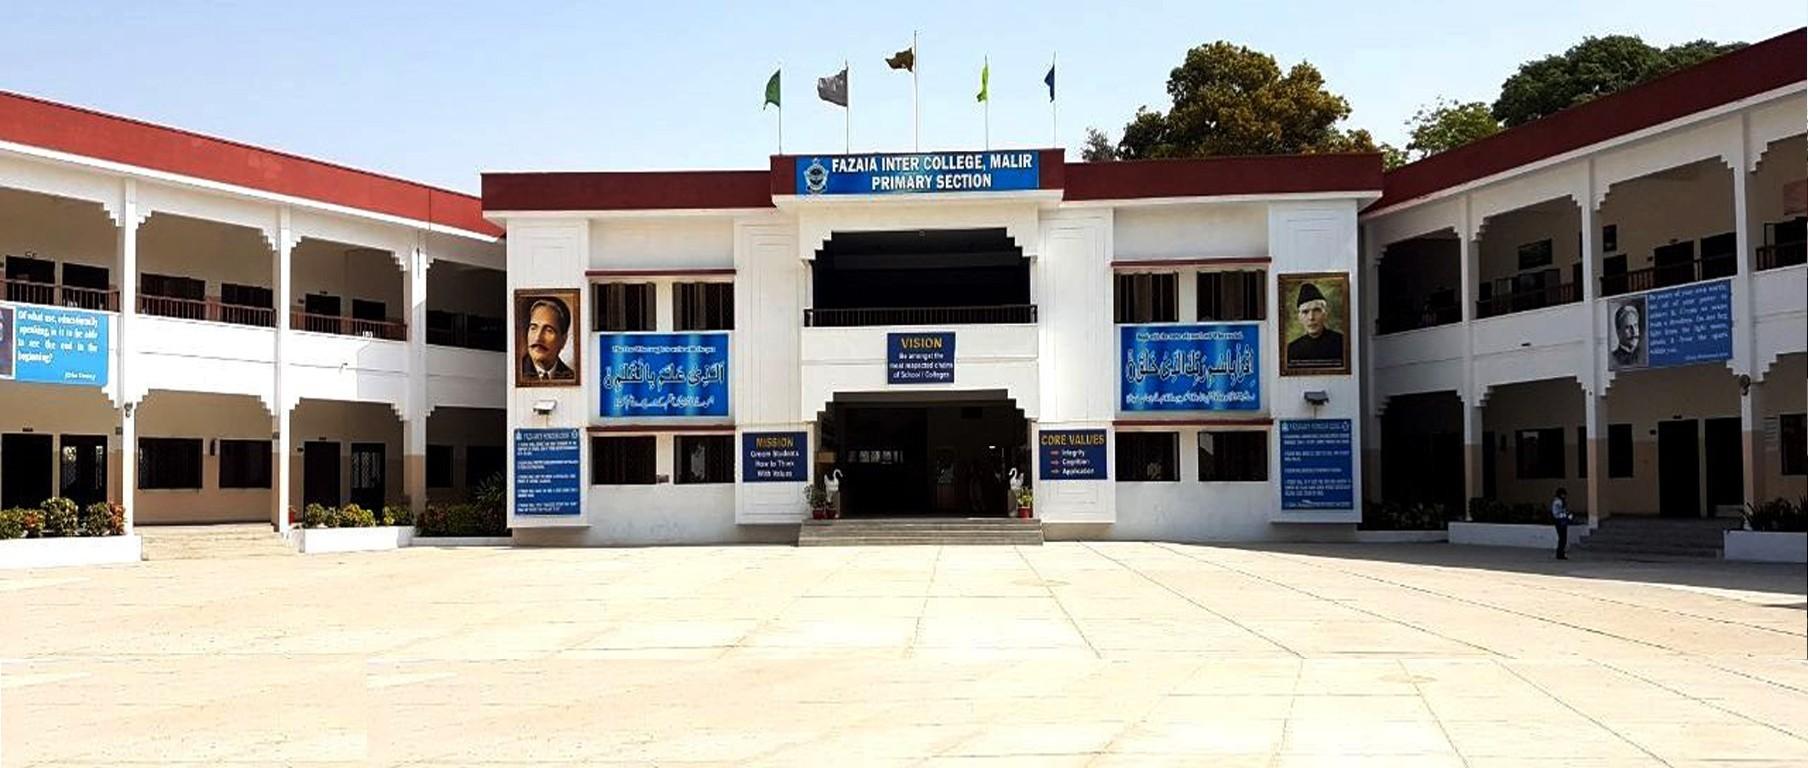 1-Fazaia-Inter-College,-Malir_1584172835.jpg